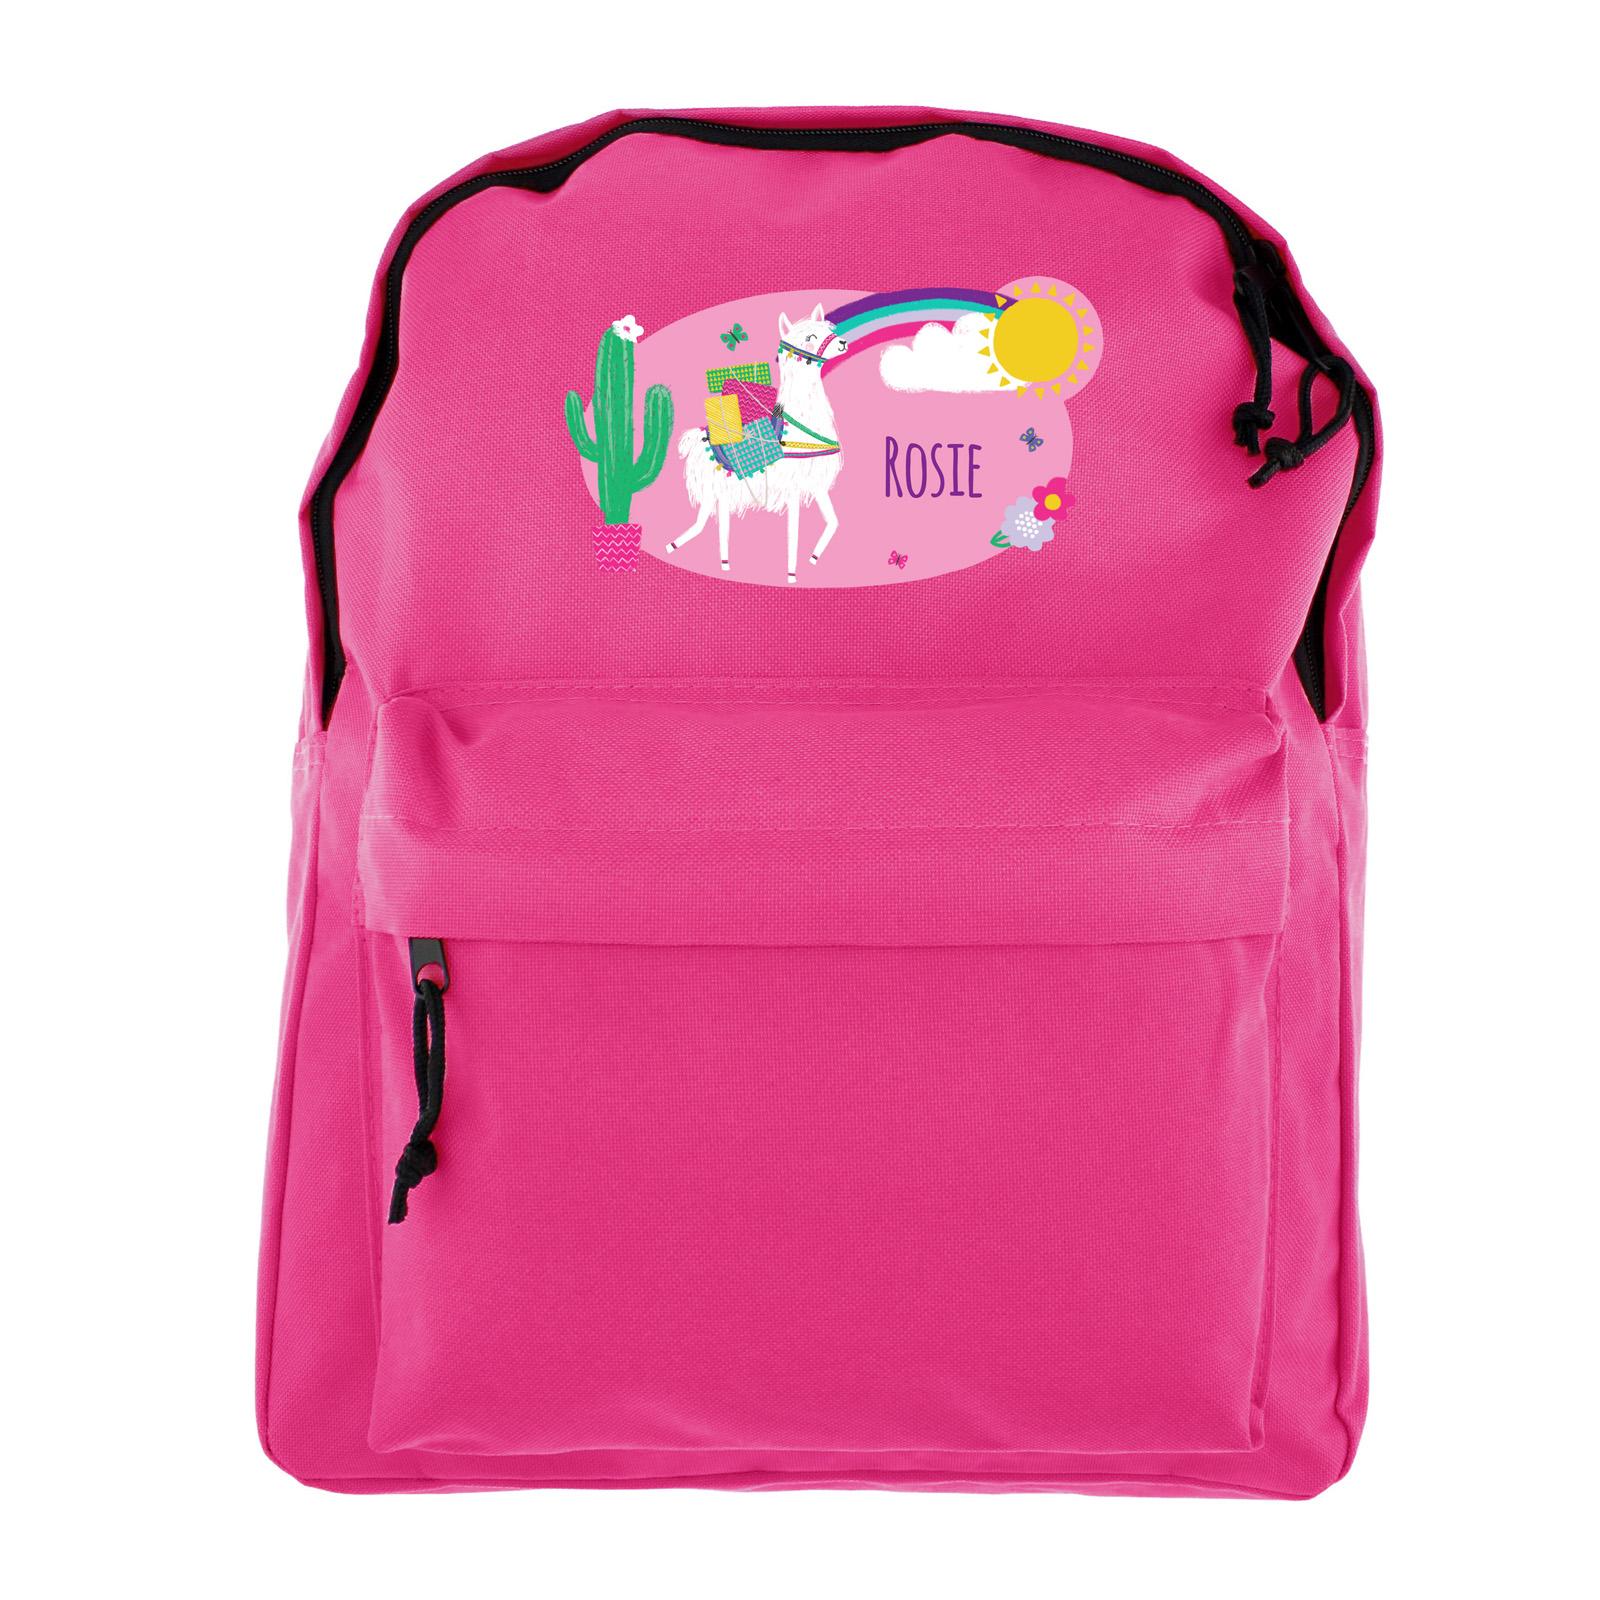 Buy Personalised Backpack Llama For Gbp 14 99 Card Factory Uk